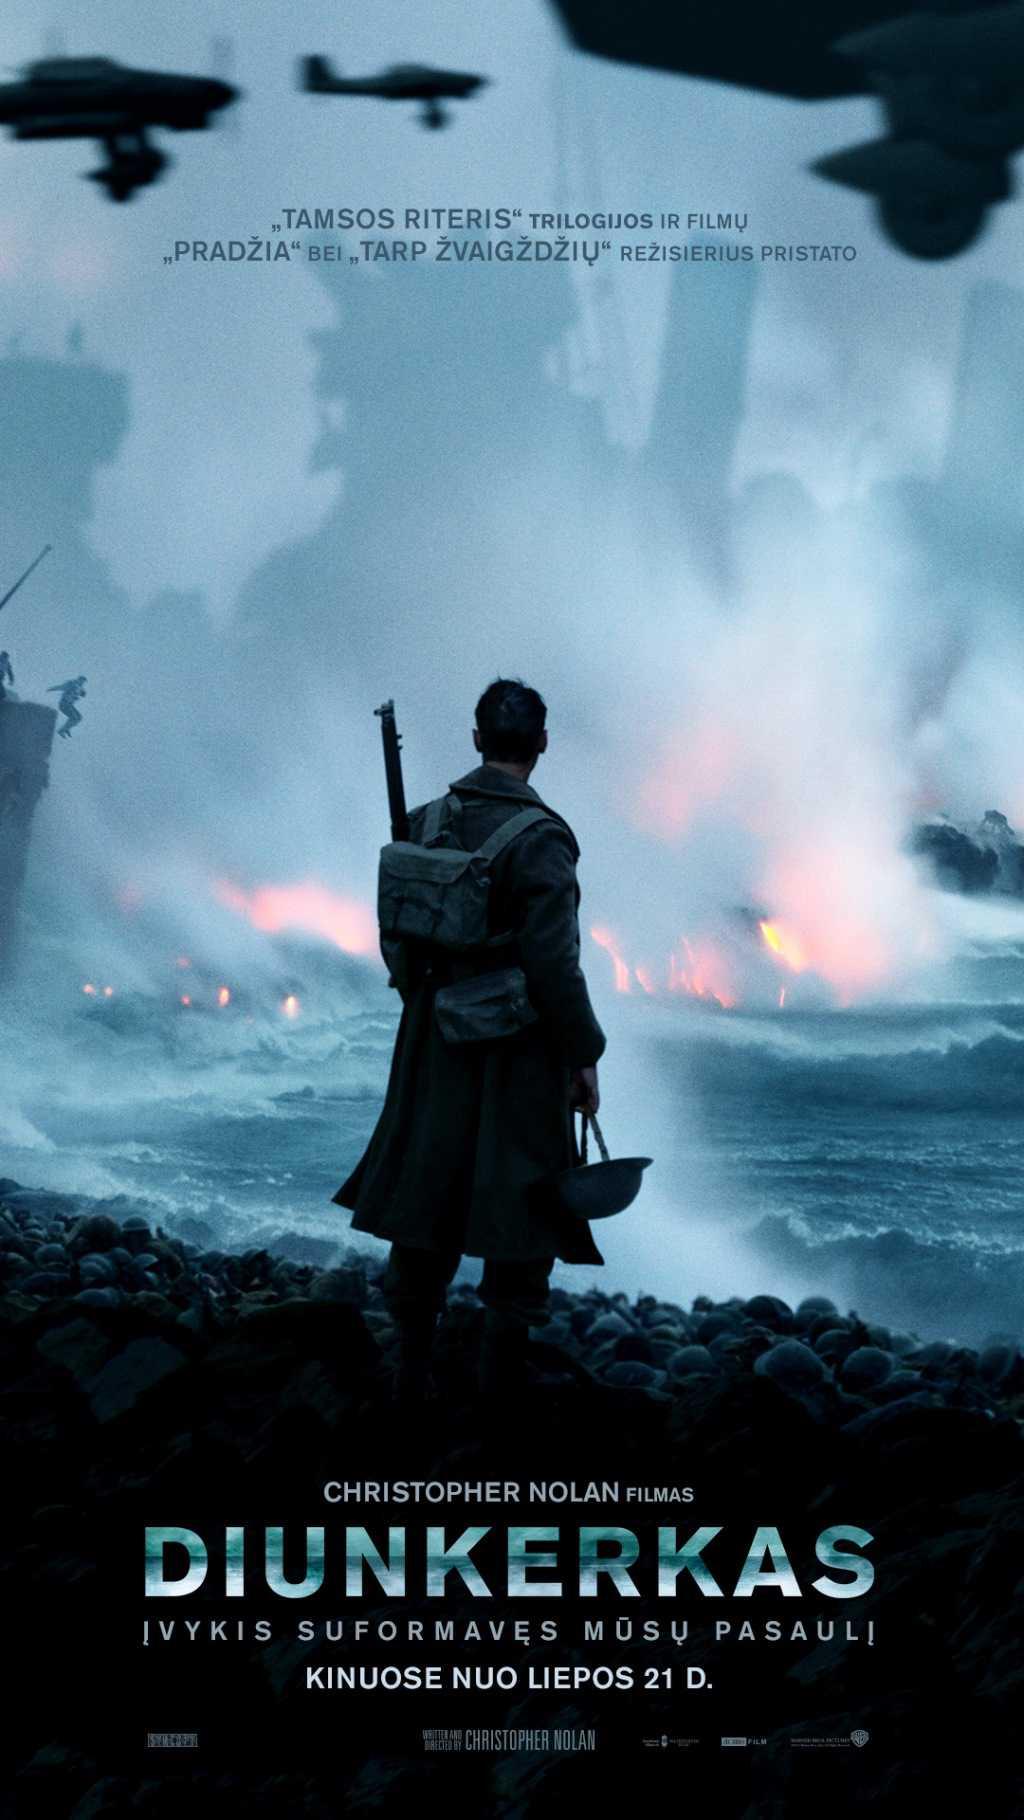 Diunkerkas (Dunkirk)